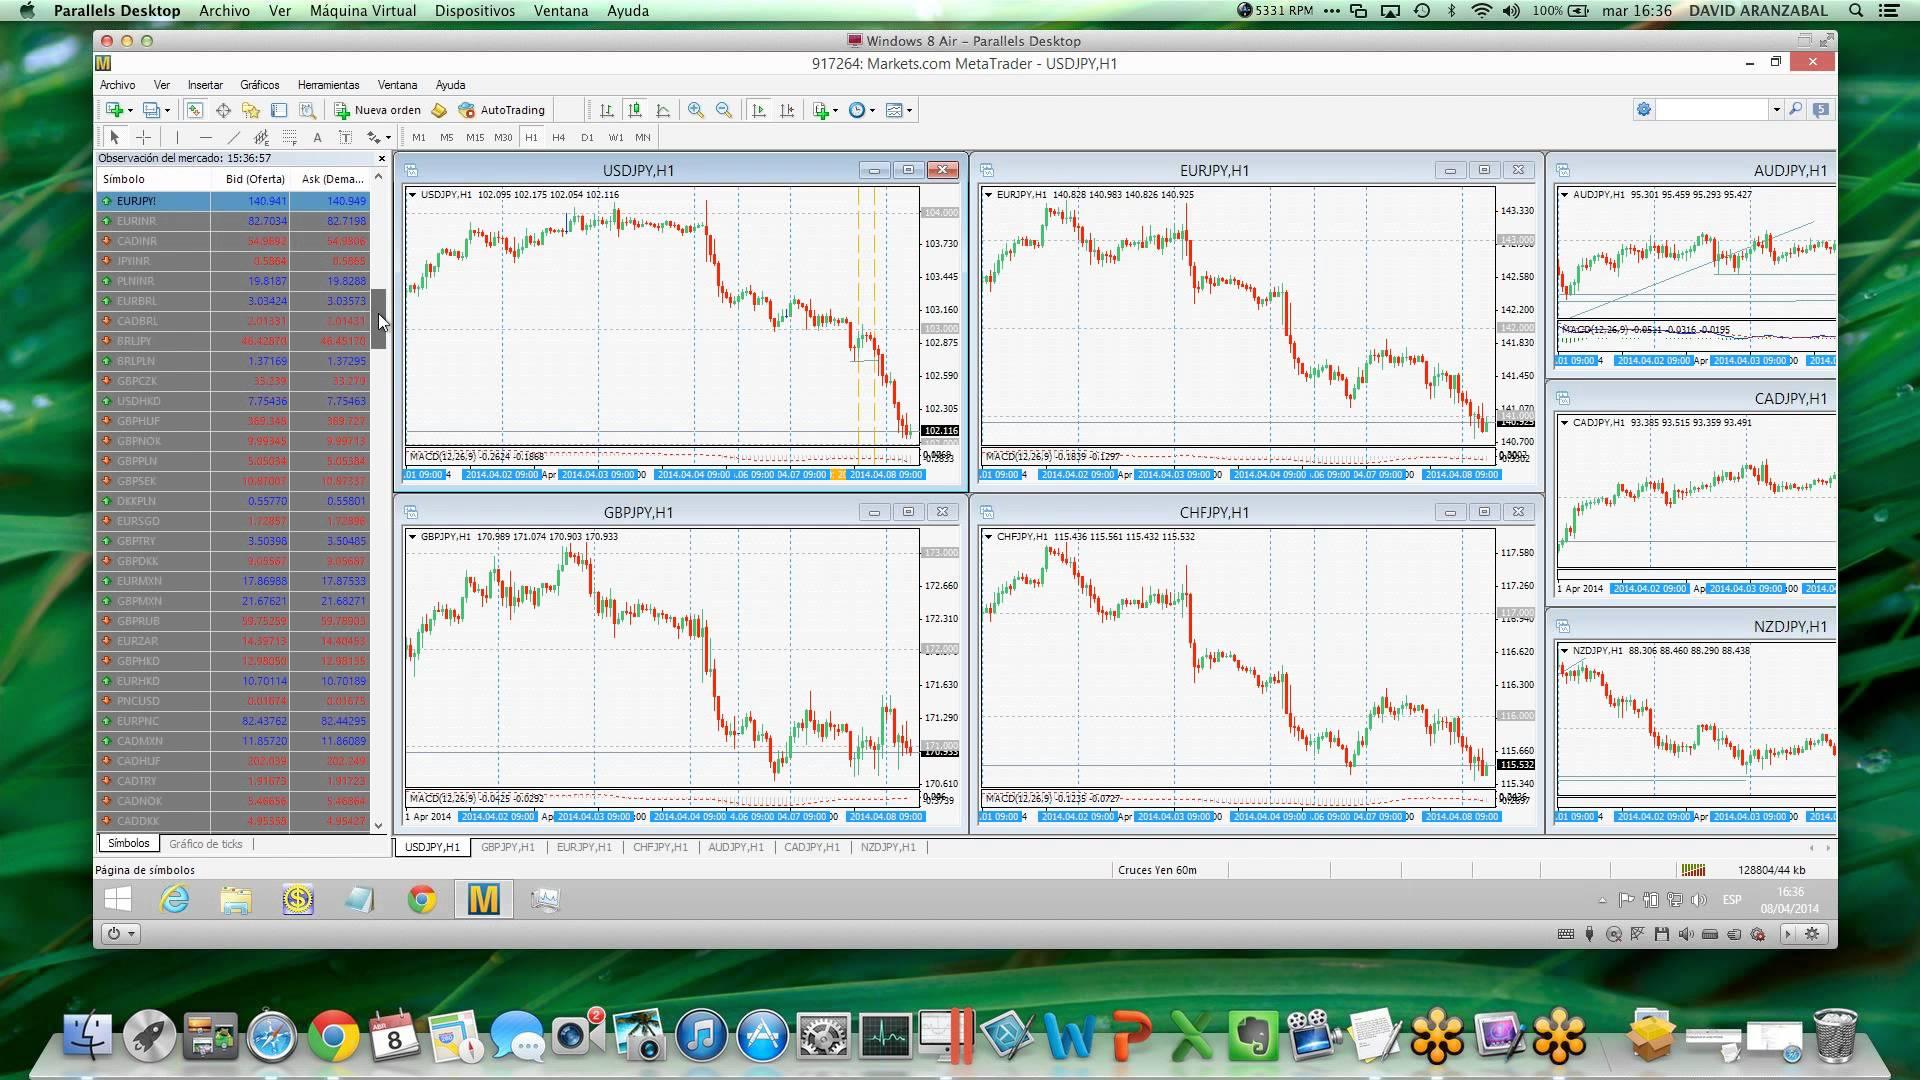 Gold options trading platforms australia